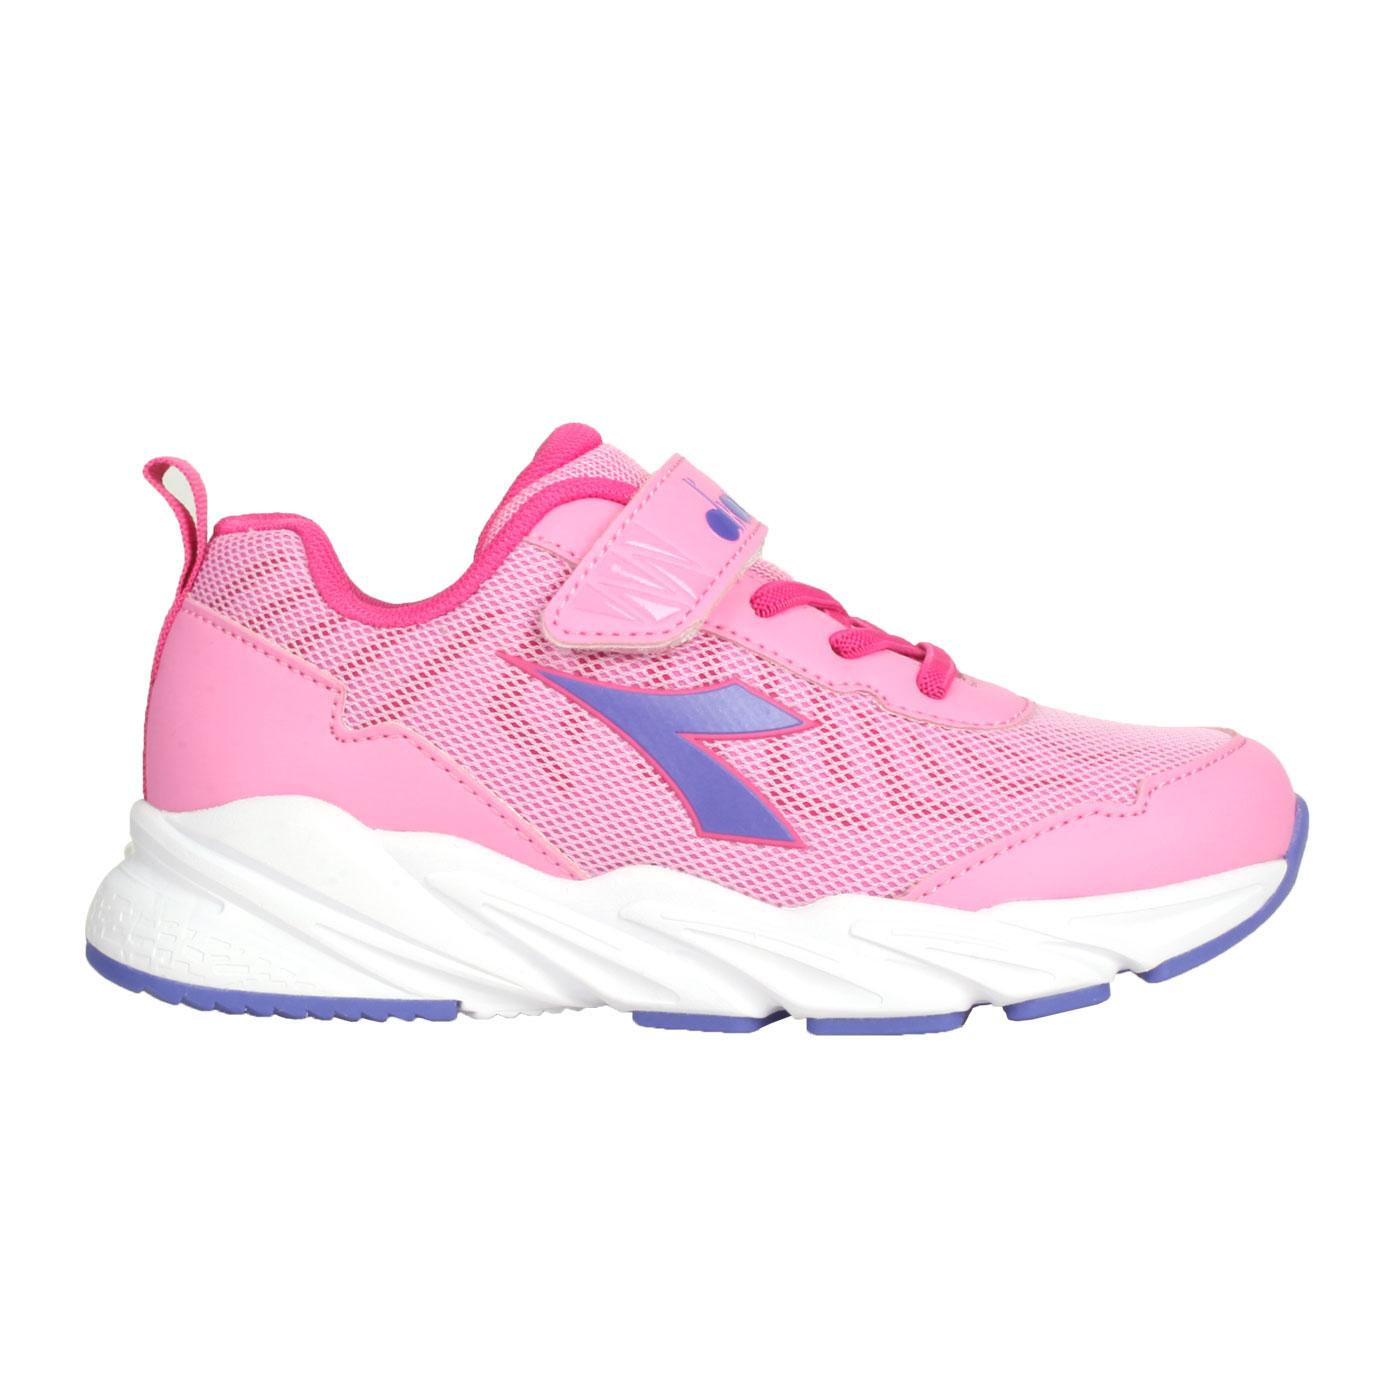 DIADORA 中童輕量慢跑鞋-超寬楦 DA13011 - 粉紅紫